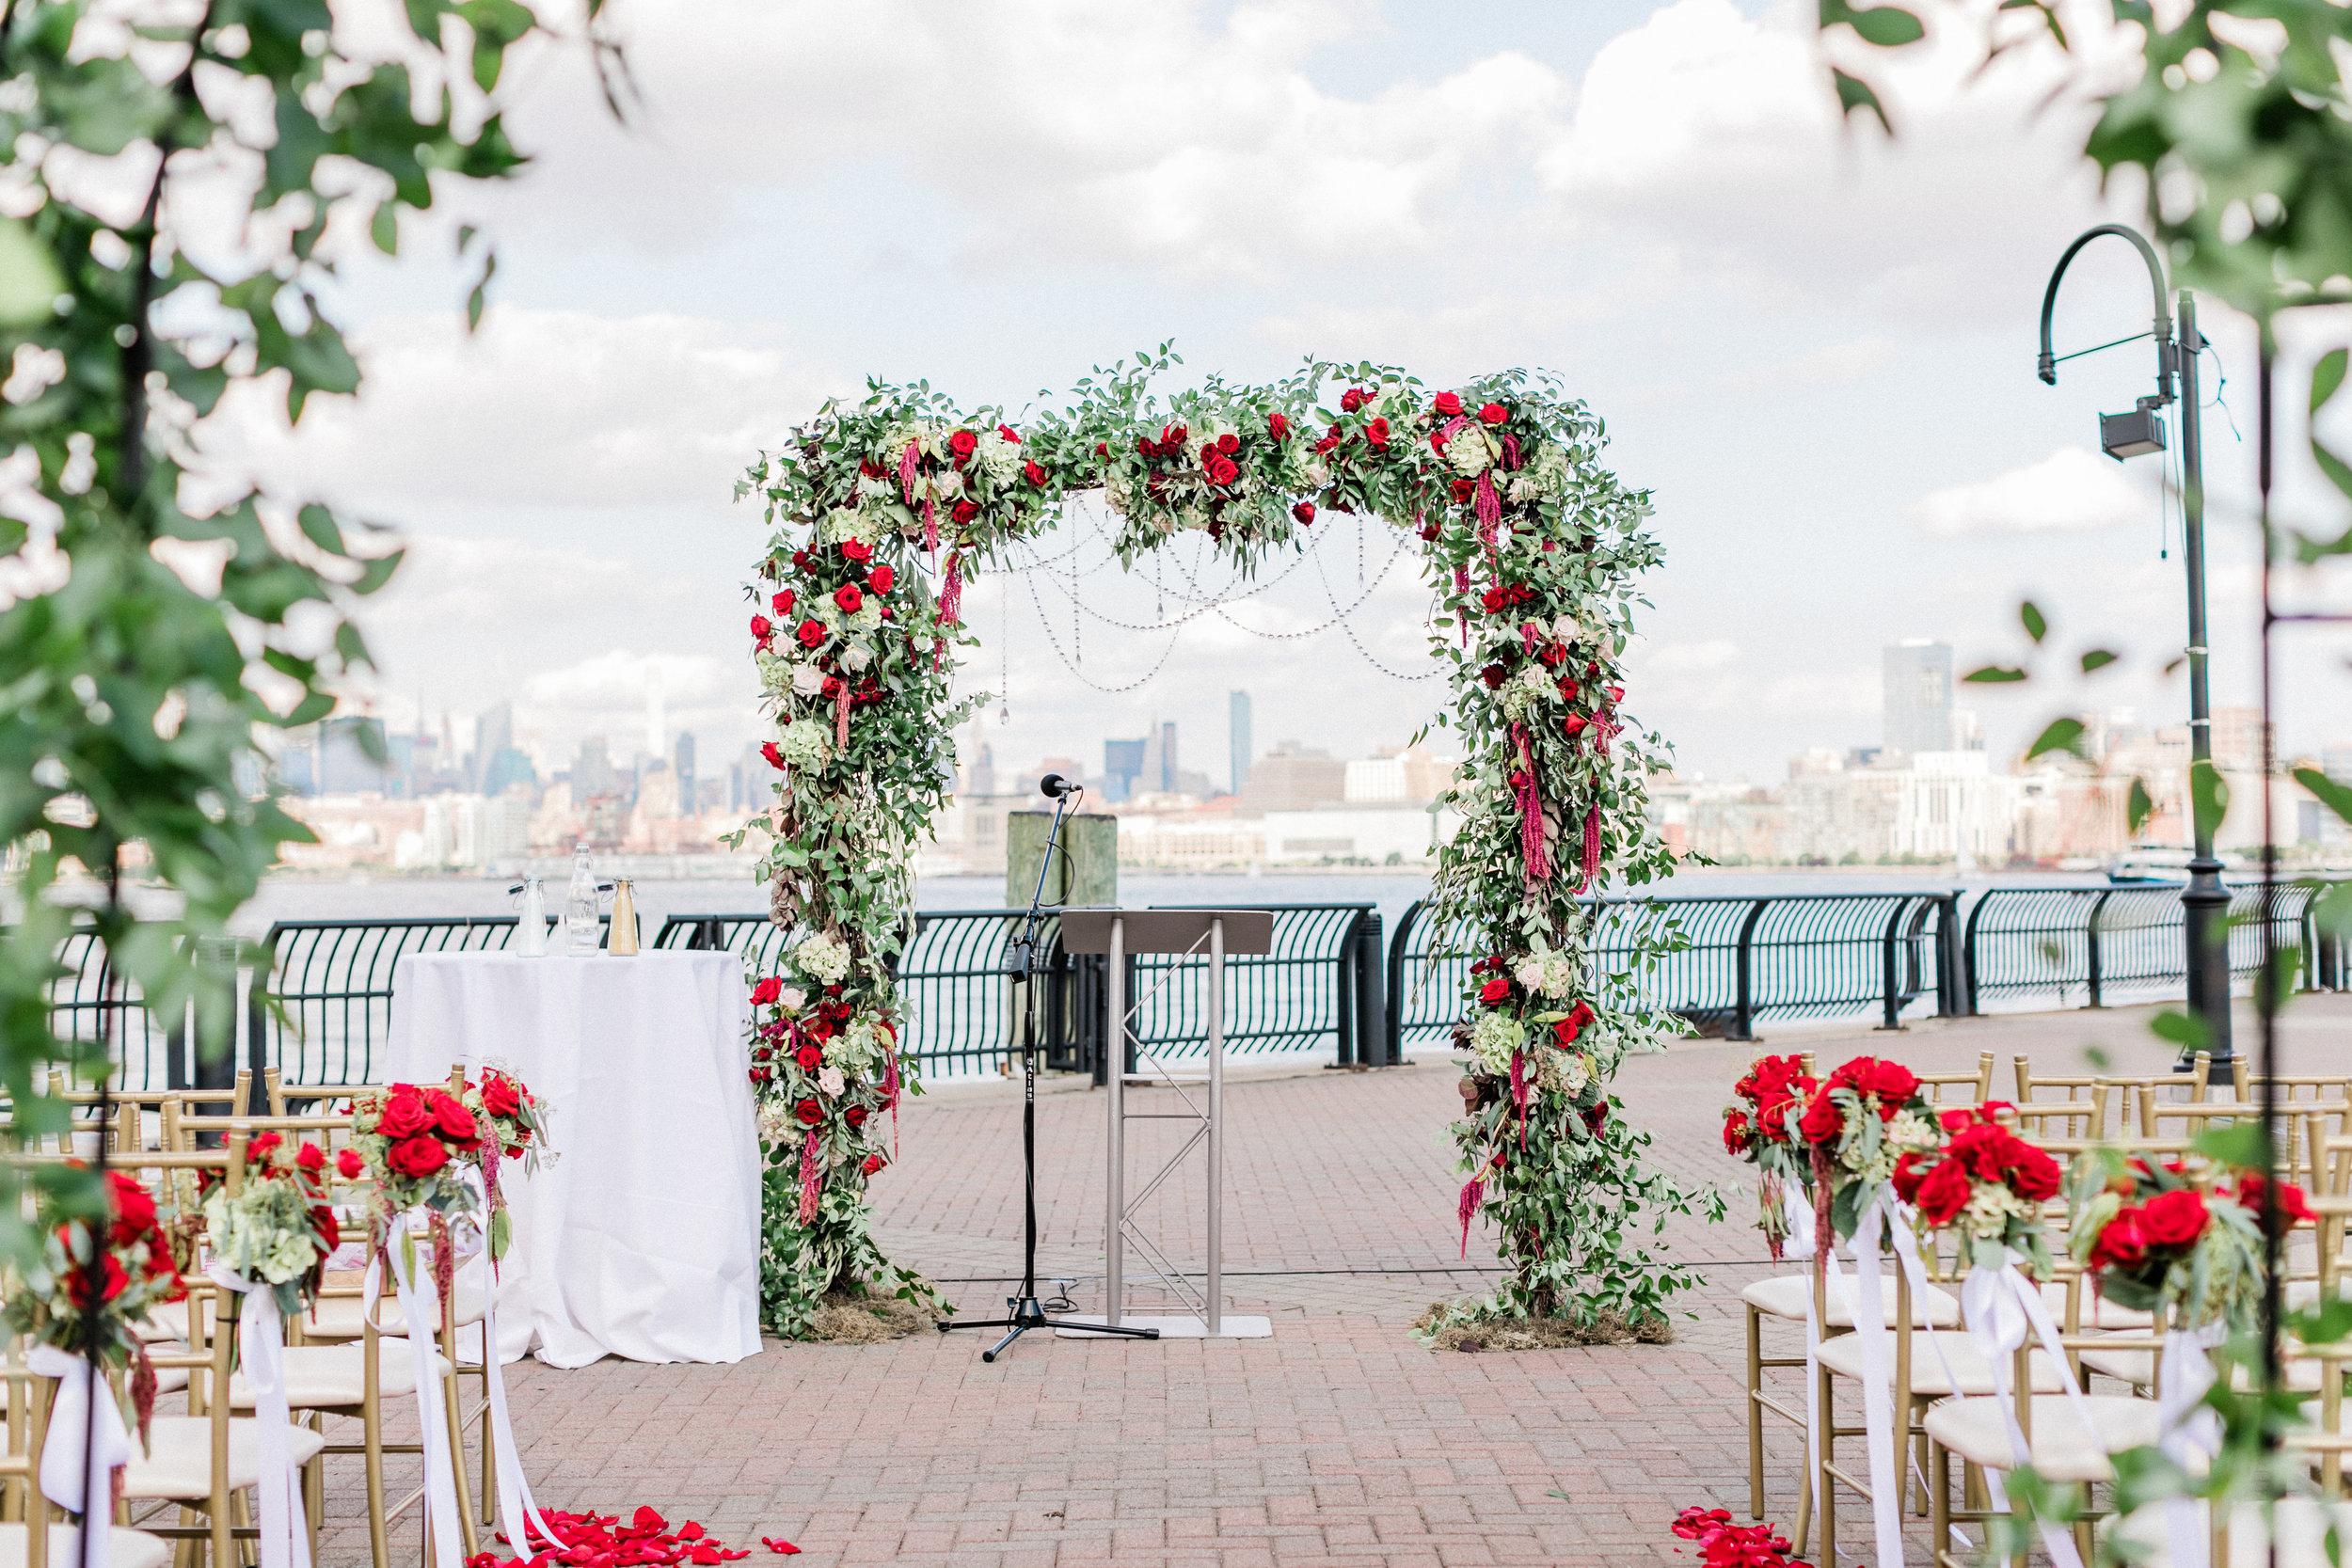 hyatt-regency-jersey-city-wedding-photographer37.jpg